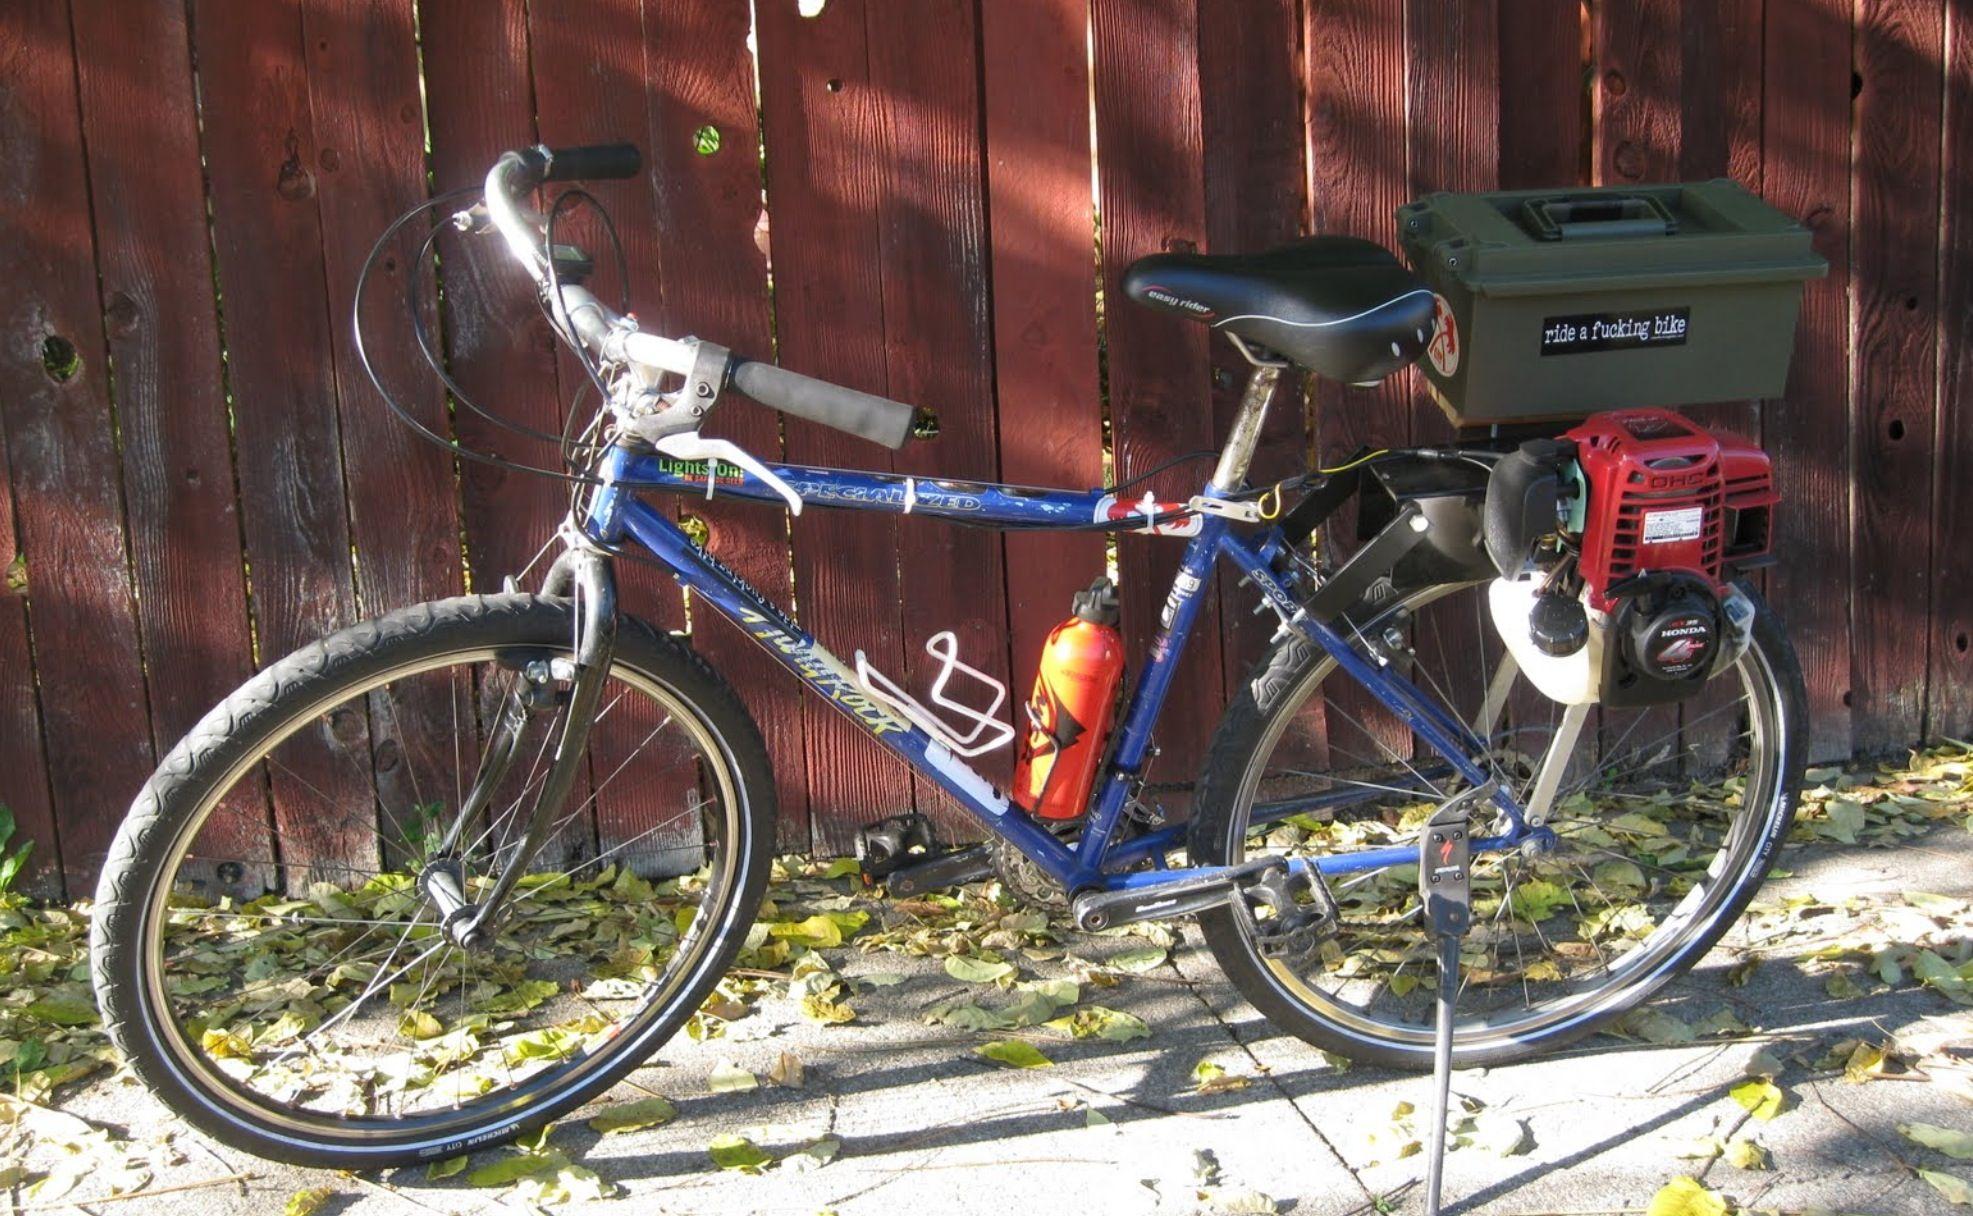 Bicycle Honda Gx25 Mini 4 Stroke Engine Pinterest